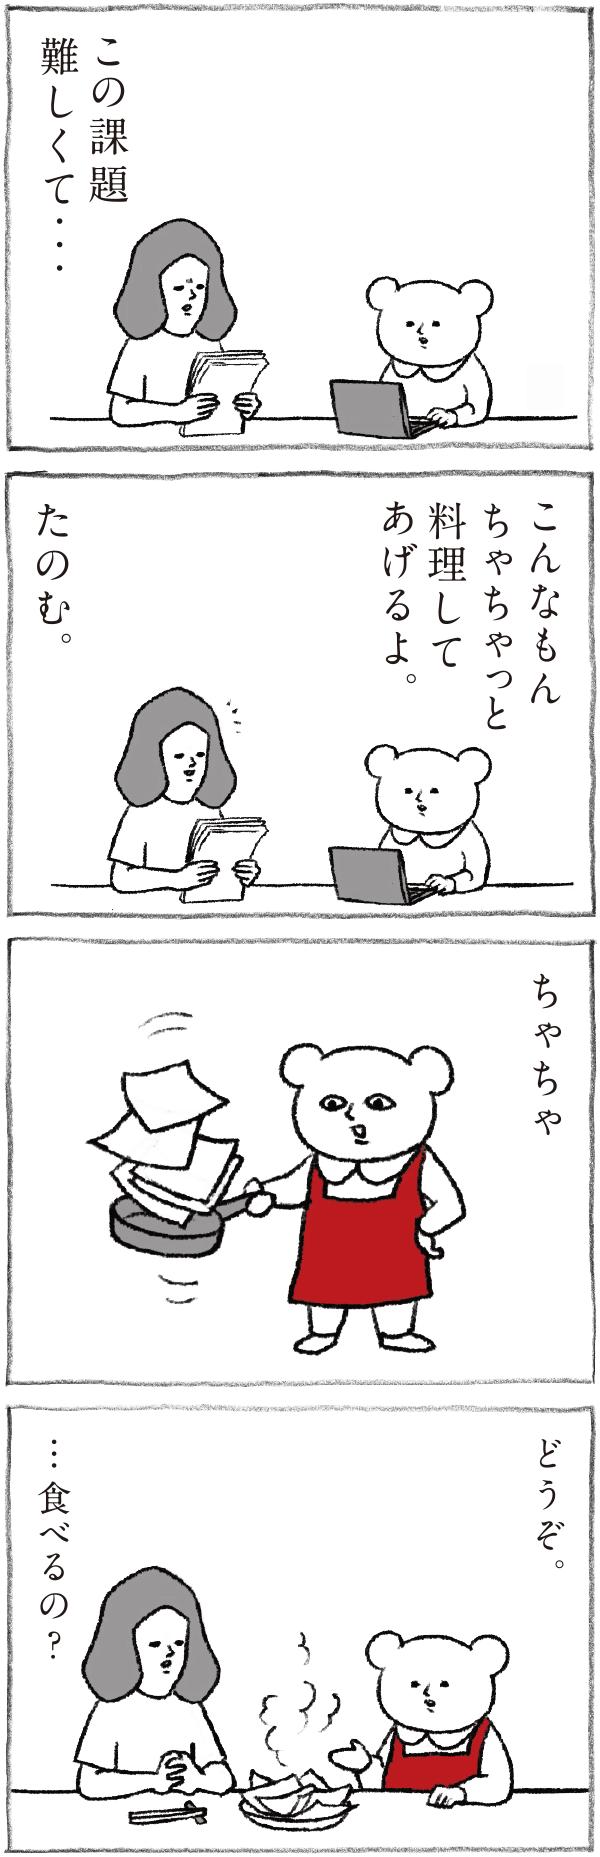 Hanako 1197号:おかわり自由